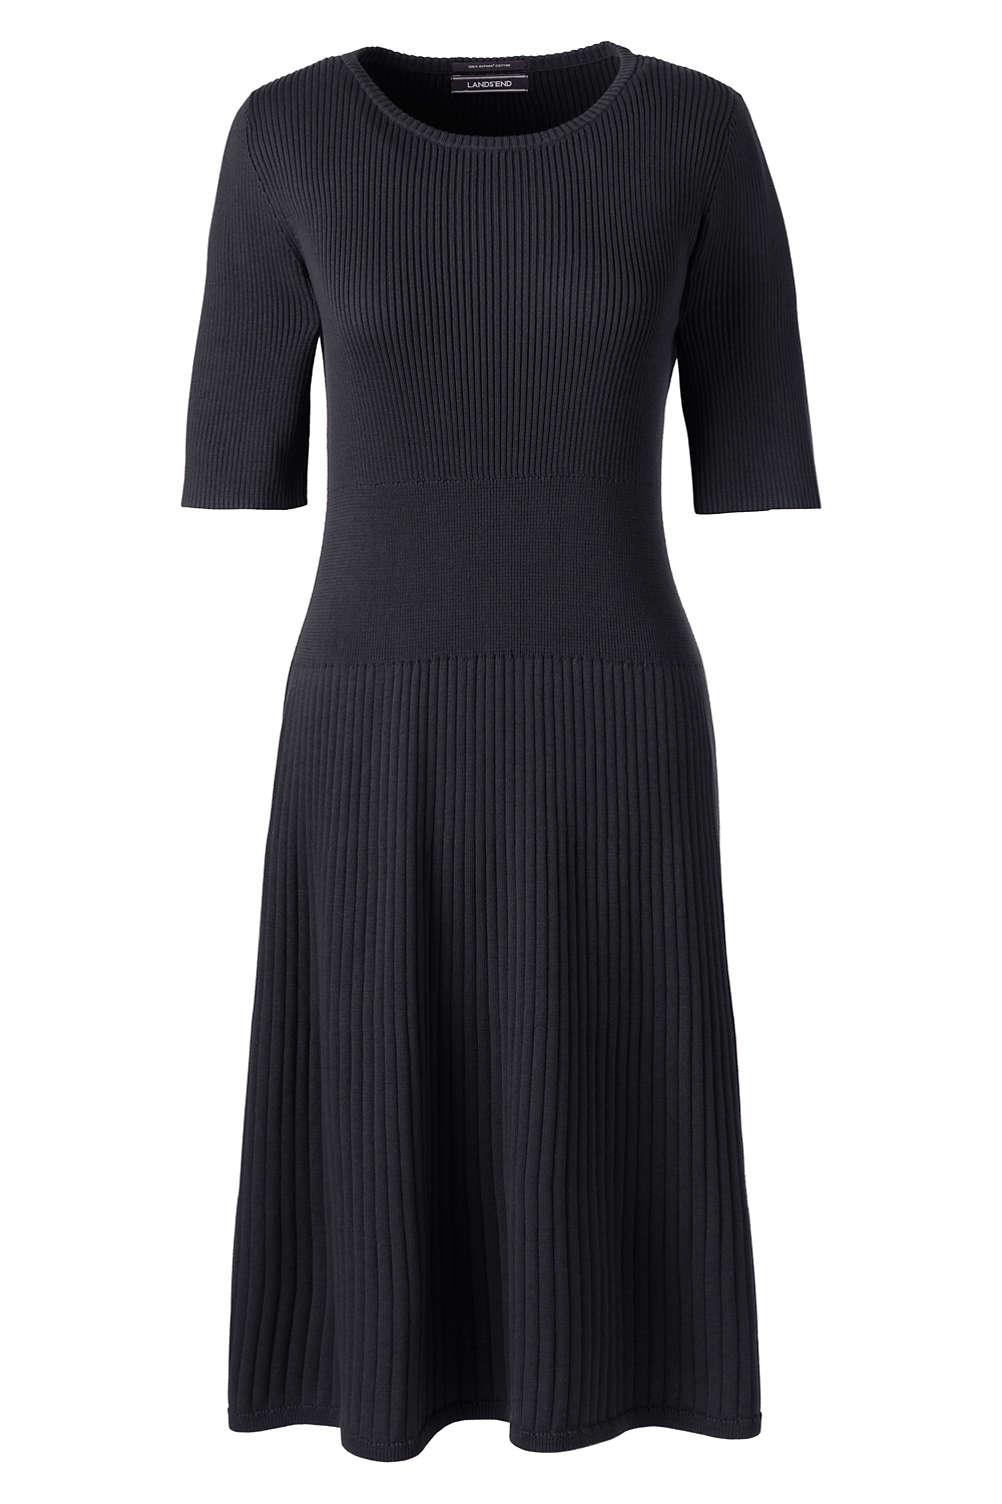 d4efac16f2ac Women's Elbow Sleeve Fine Gauge Rib Sweater Dress from Lands' End